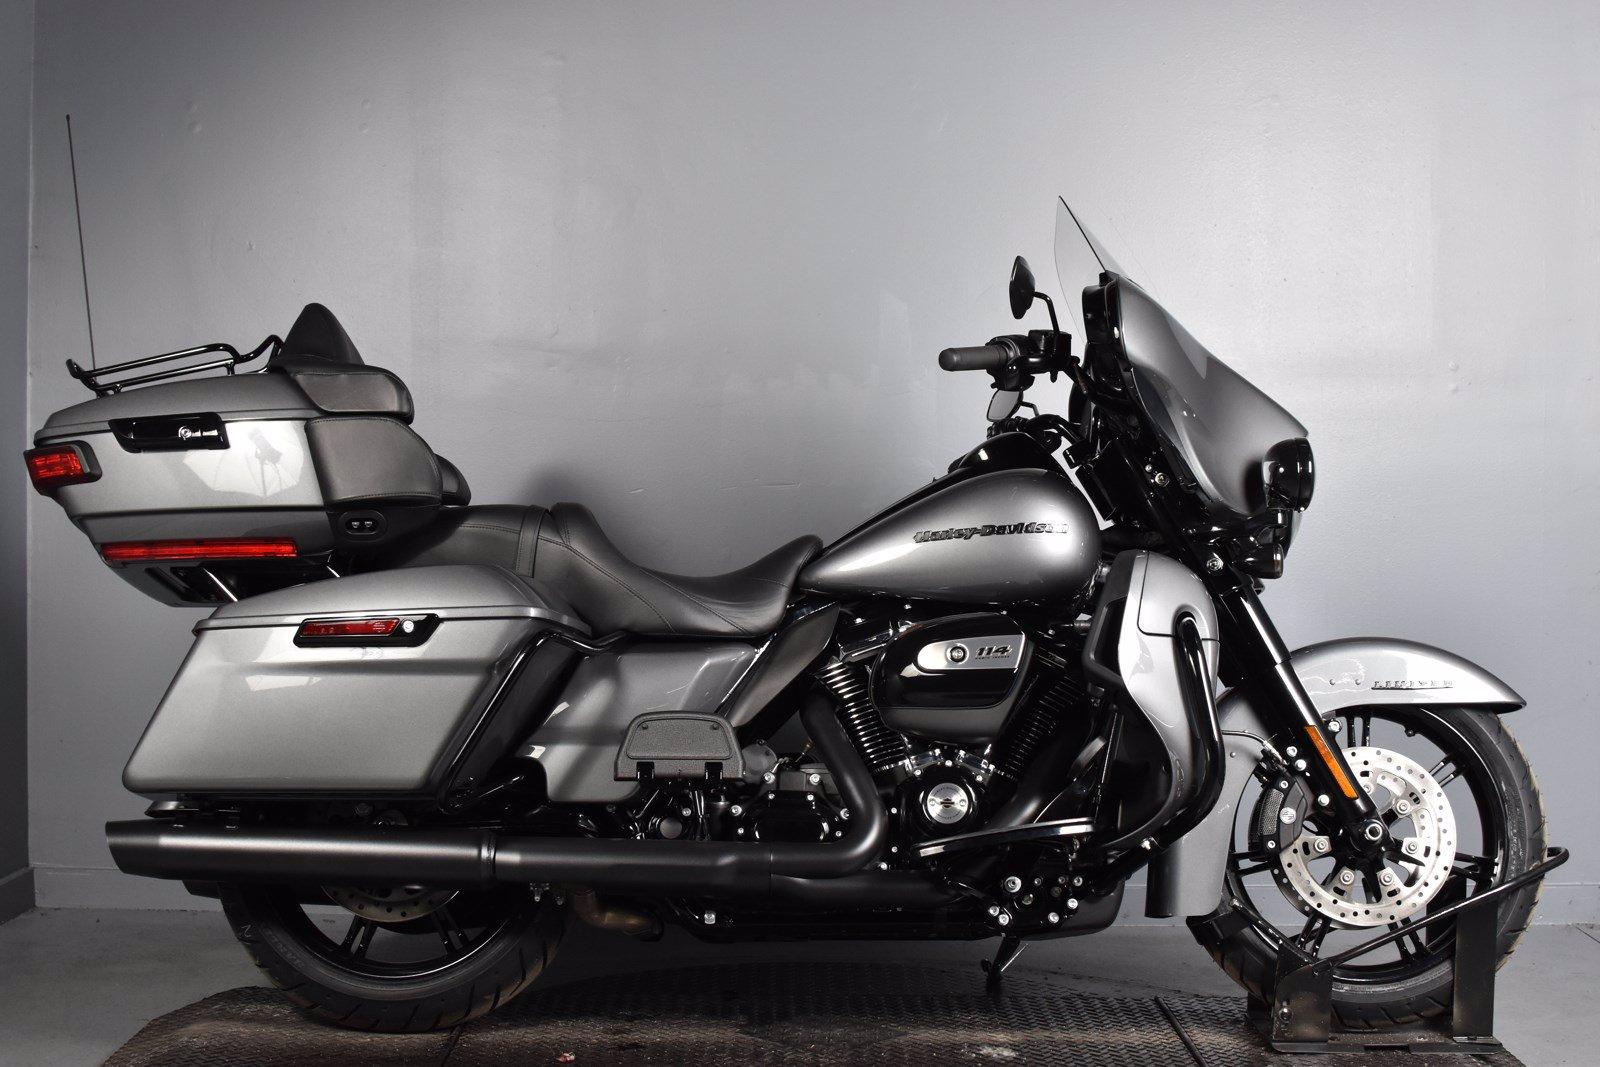 New 2021 Harley Davidson Ultra Limited Black Flhtk Touring